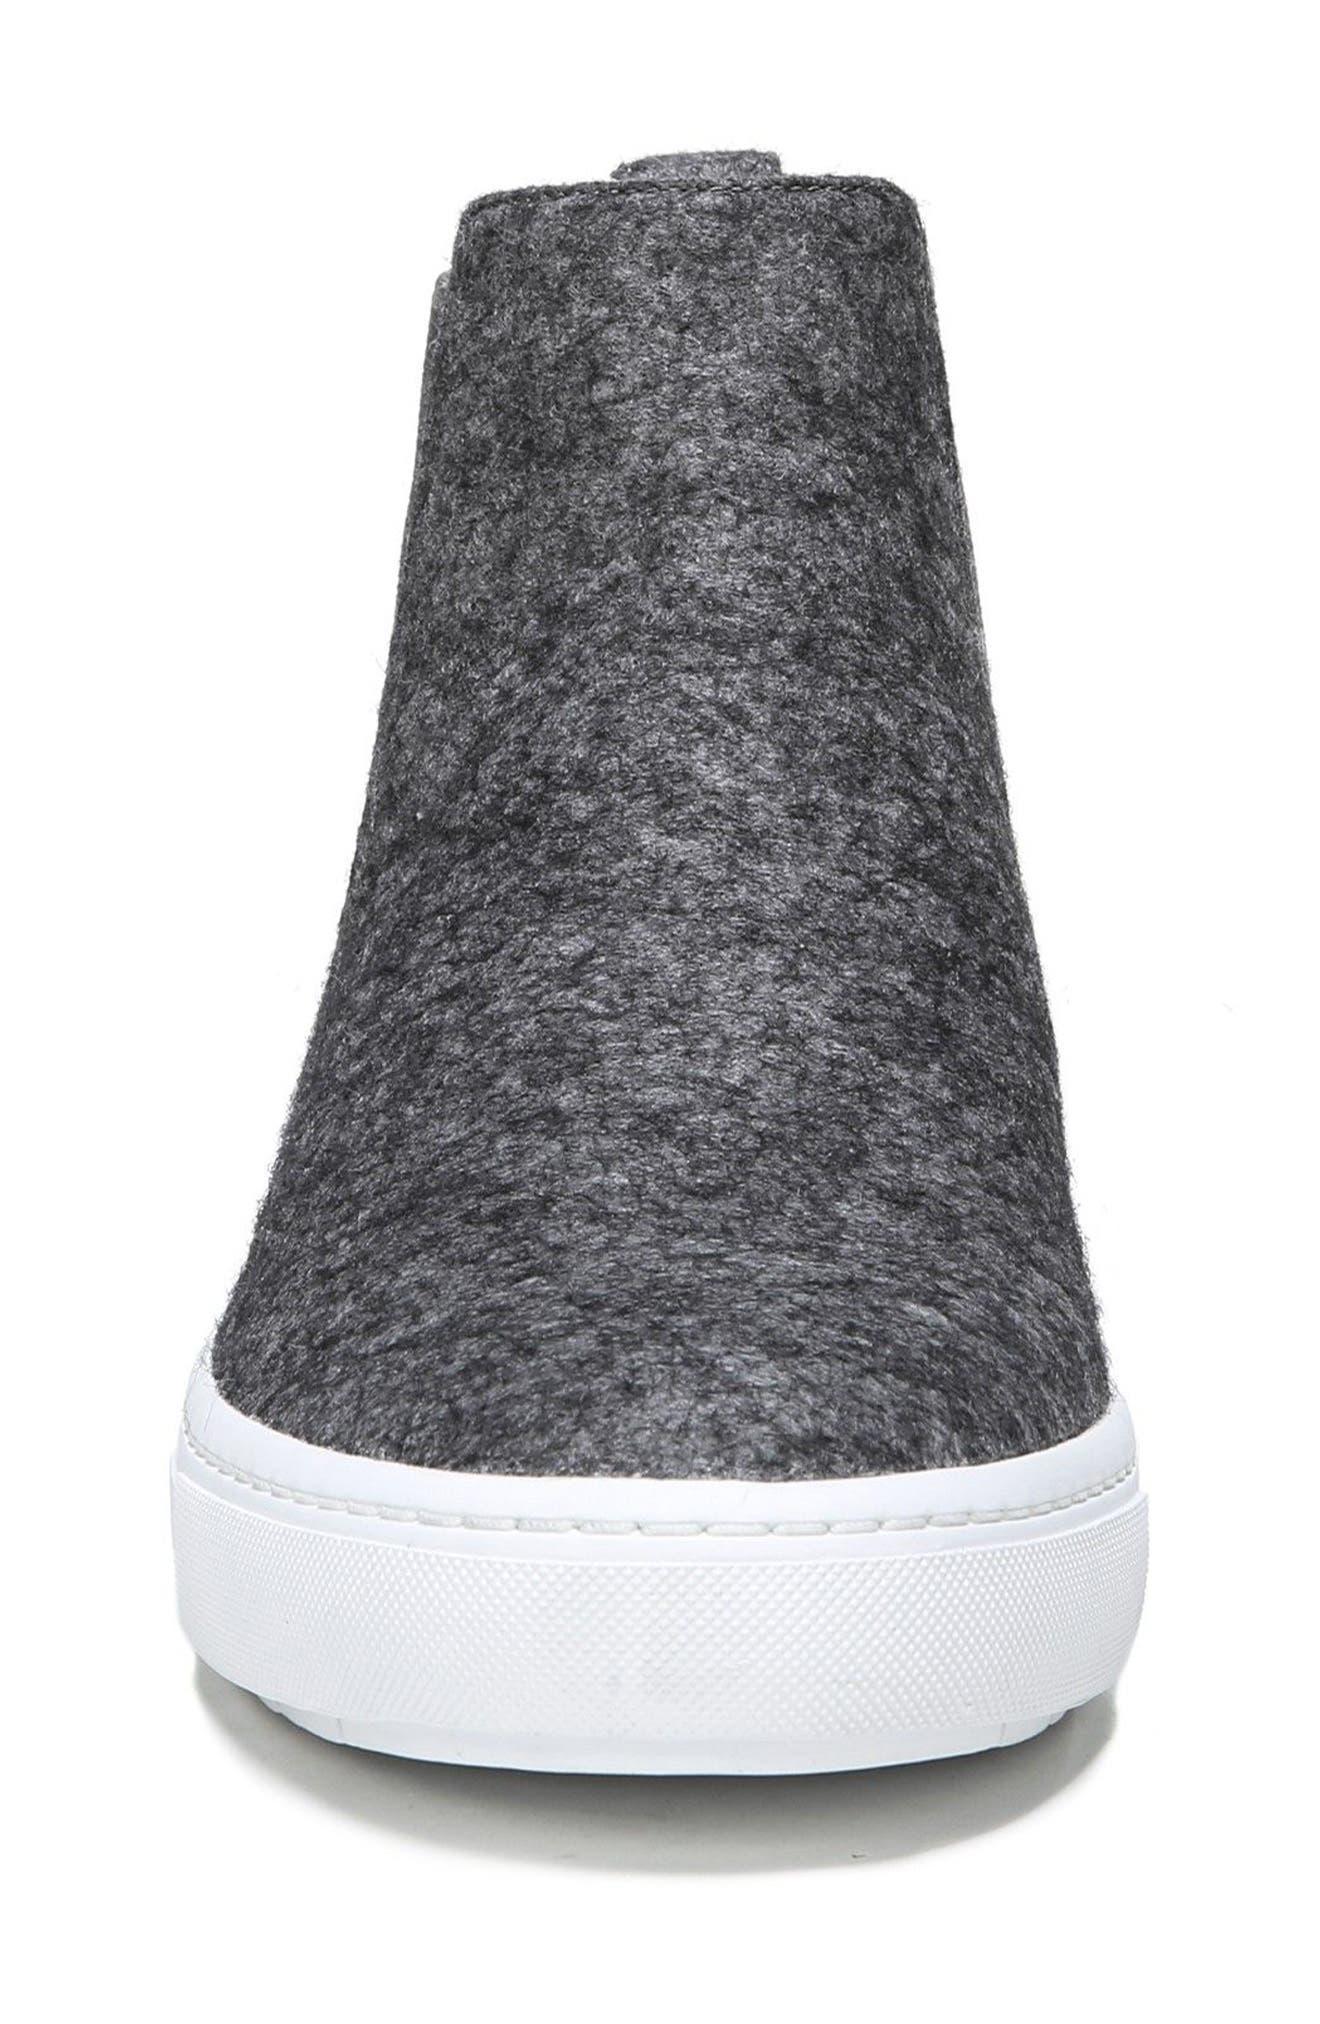 Newlyn High Top Sneaker,                             Alternate thumbnail 33, color,